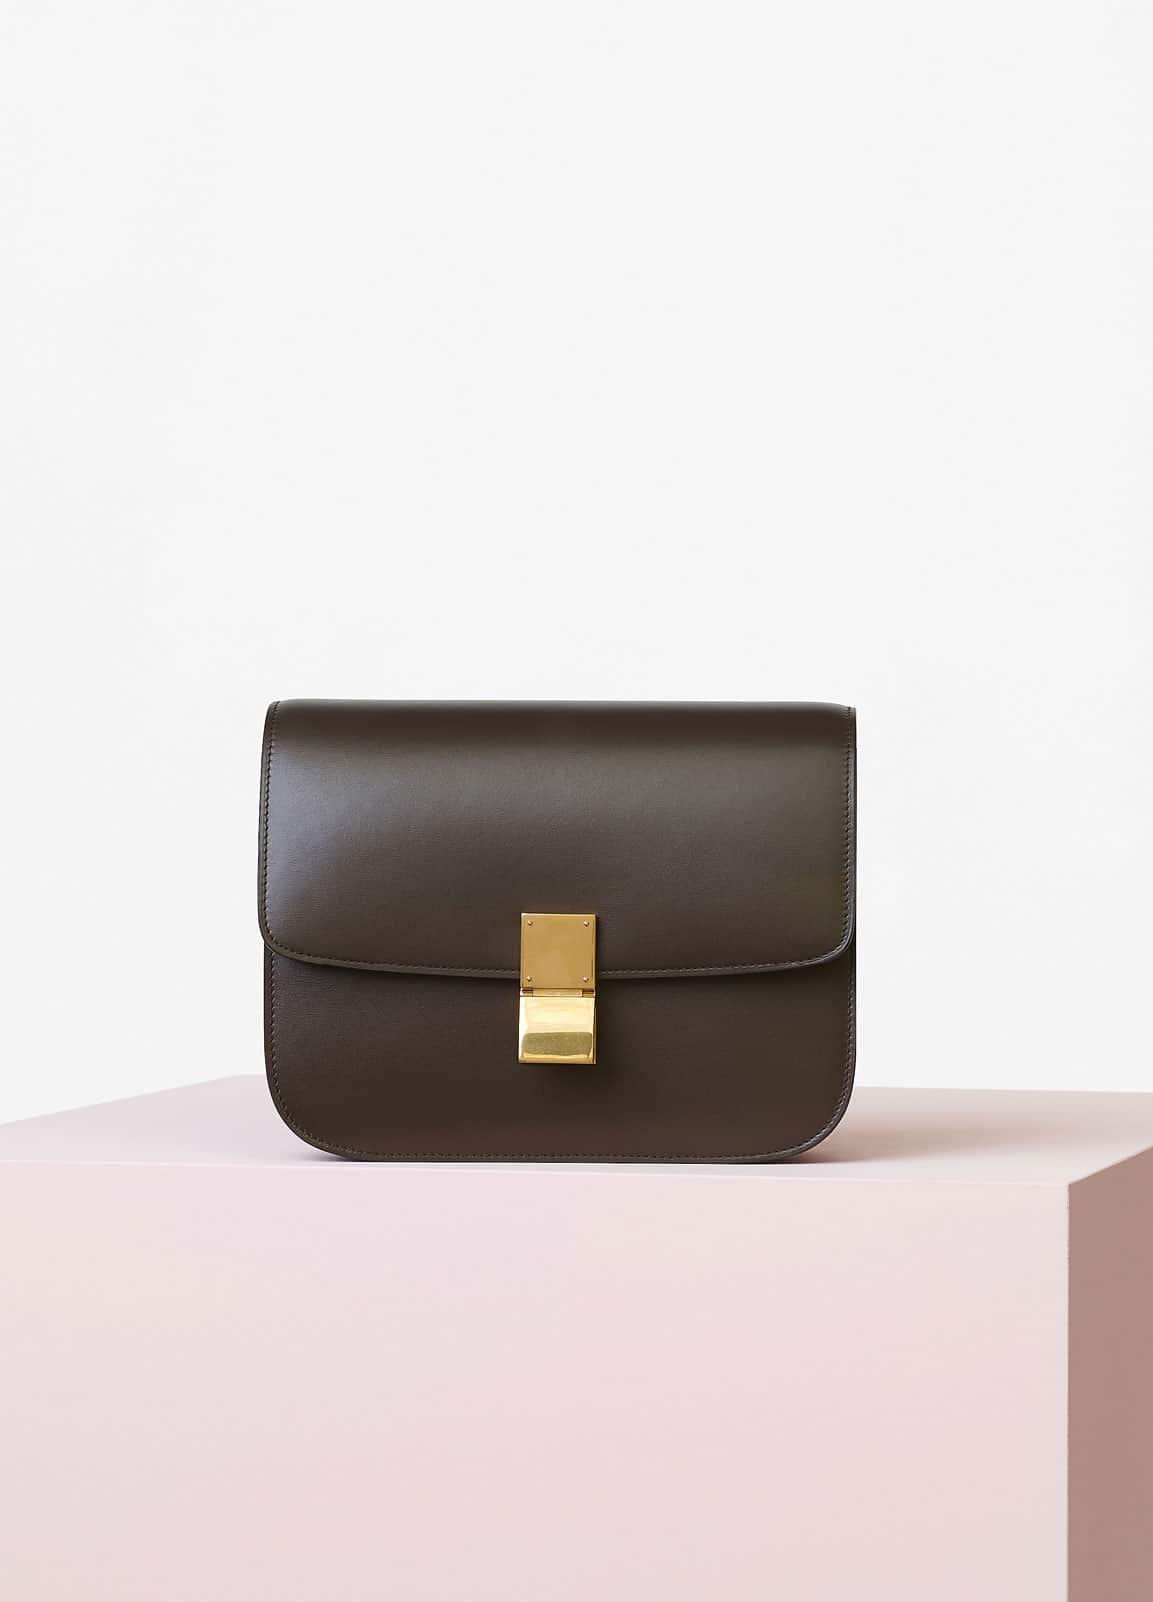 buy celine nano - Celine Resort 2016 Bag Collection Featuring New Saddle Bags ...